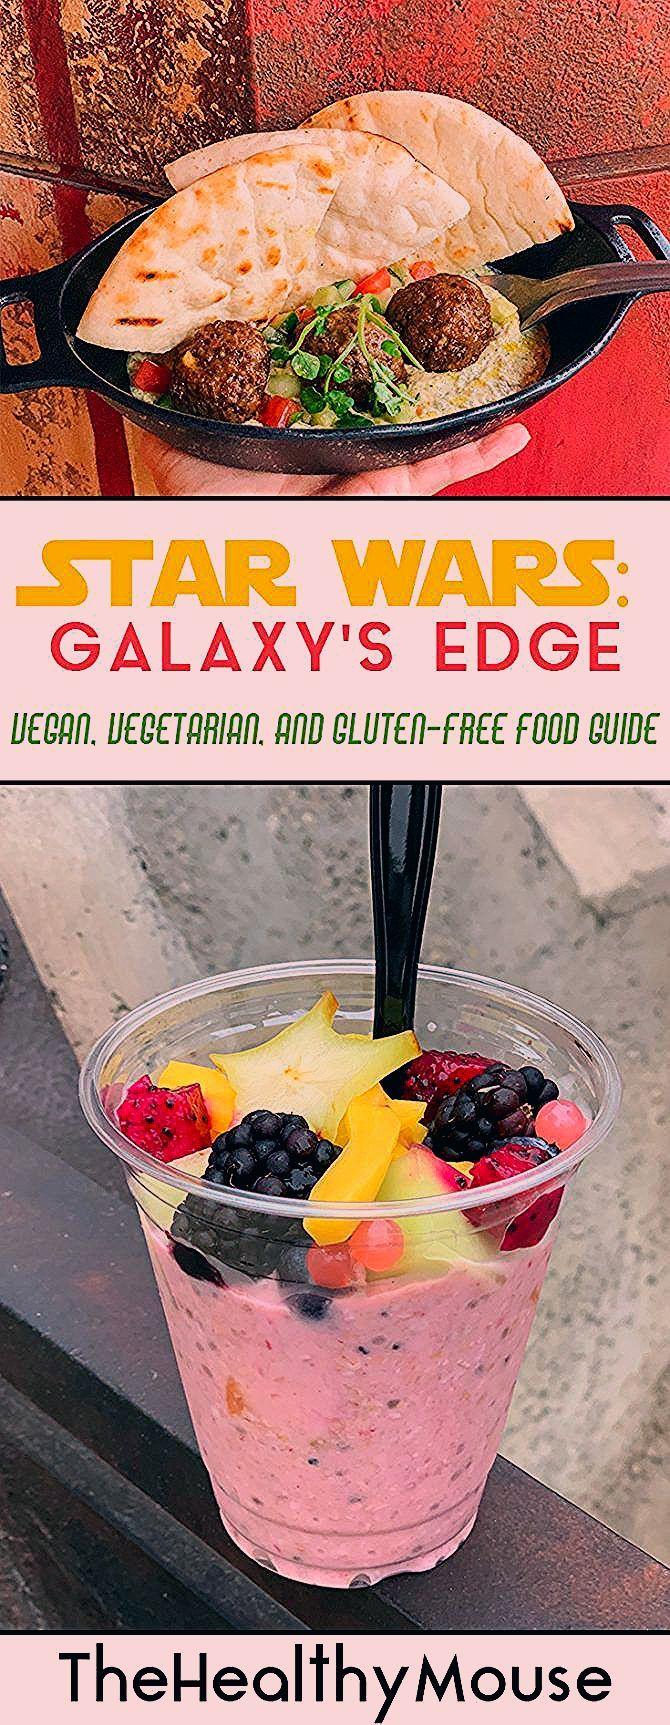 Photo of Star Wars: Galaxy's Edge Vegan, Vegetarian, and Gluten-Free Food Guide